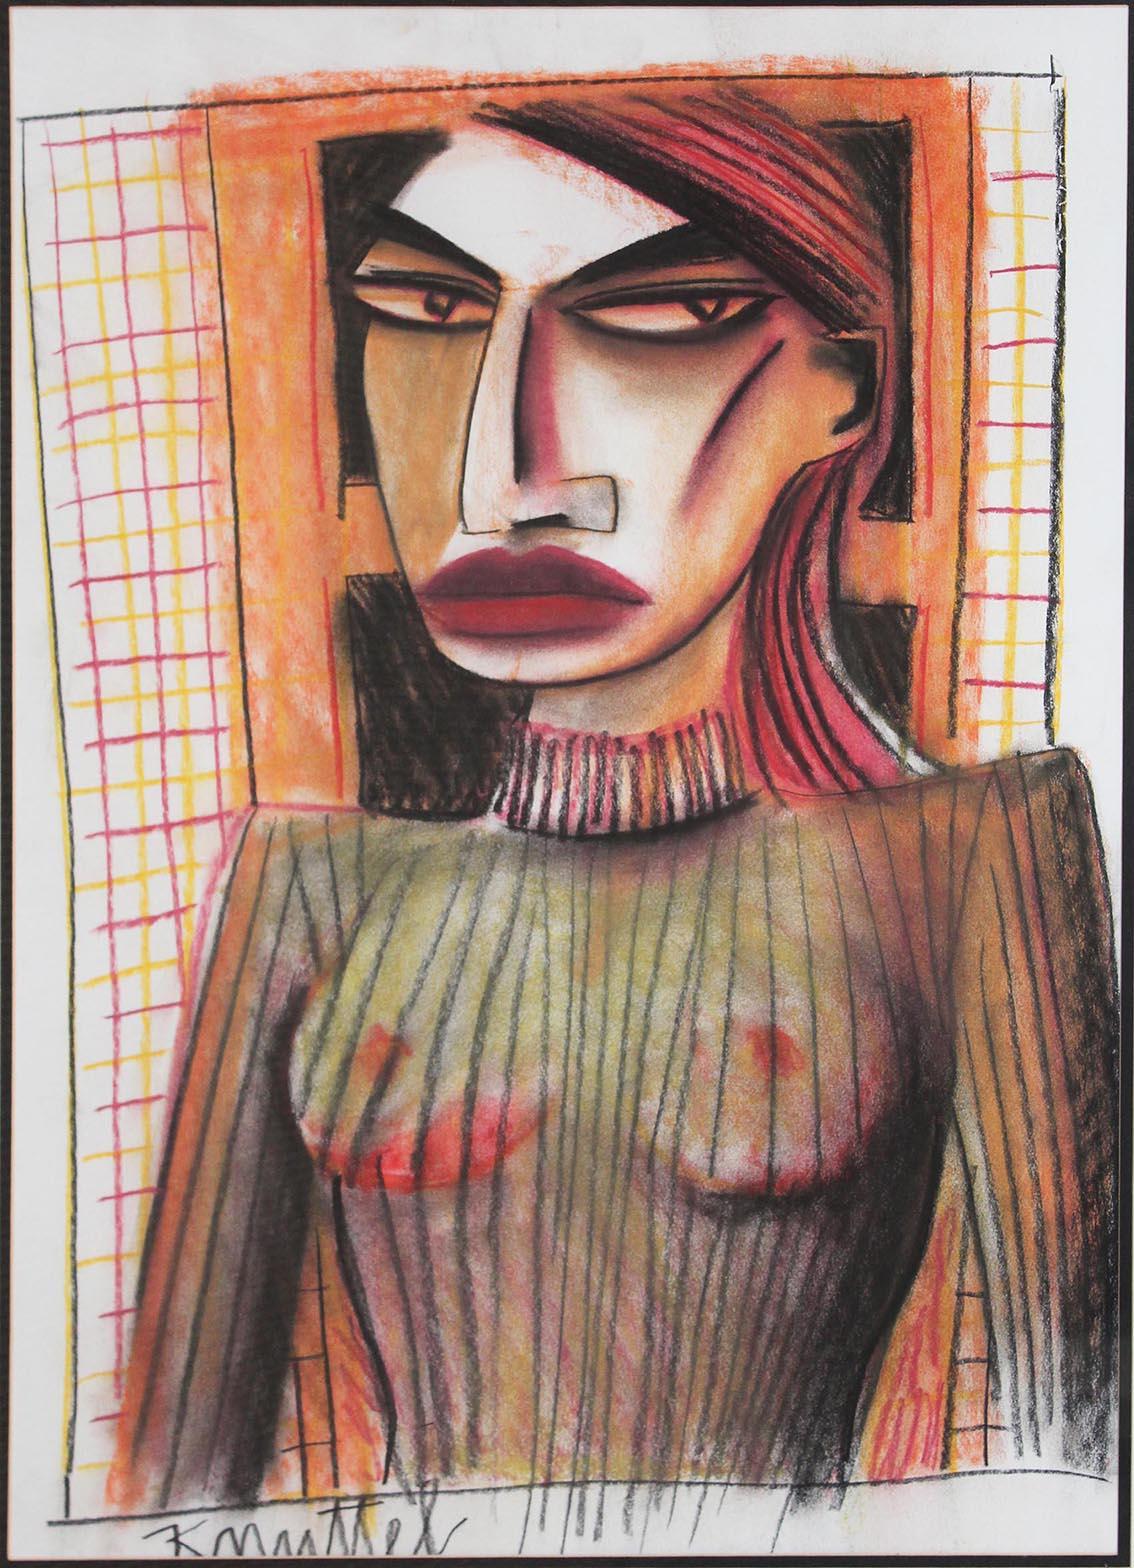 "Lot 41 - Graham Knuttel b. 1954 Female Study Pastel, 27 1/2"" x 20"" (70 x 51cm), signed."